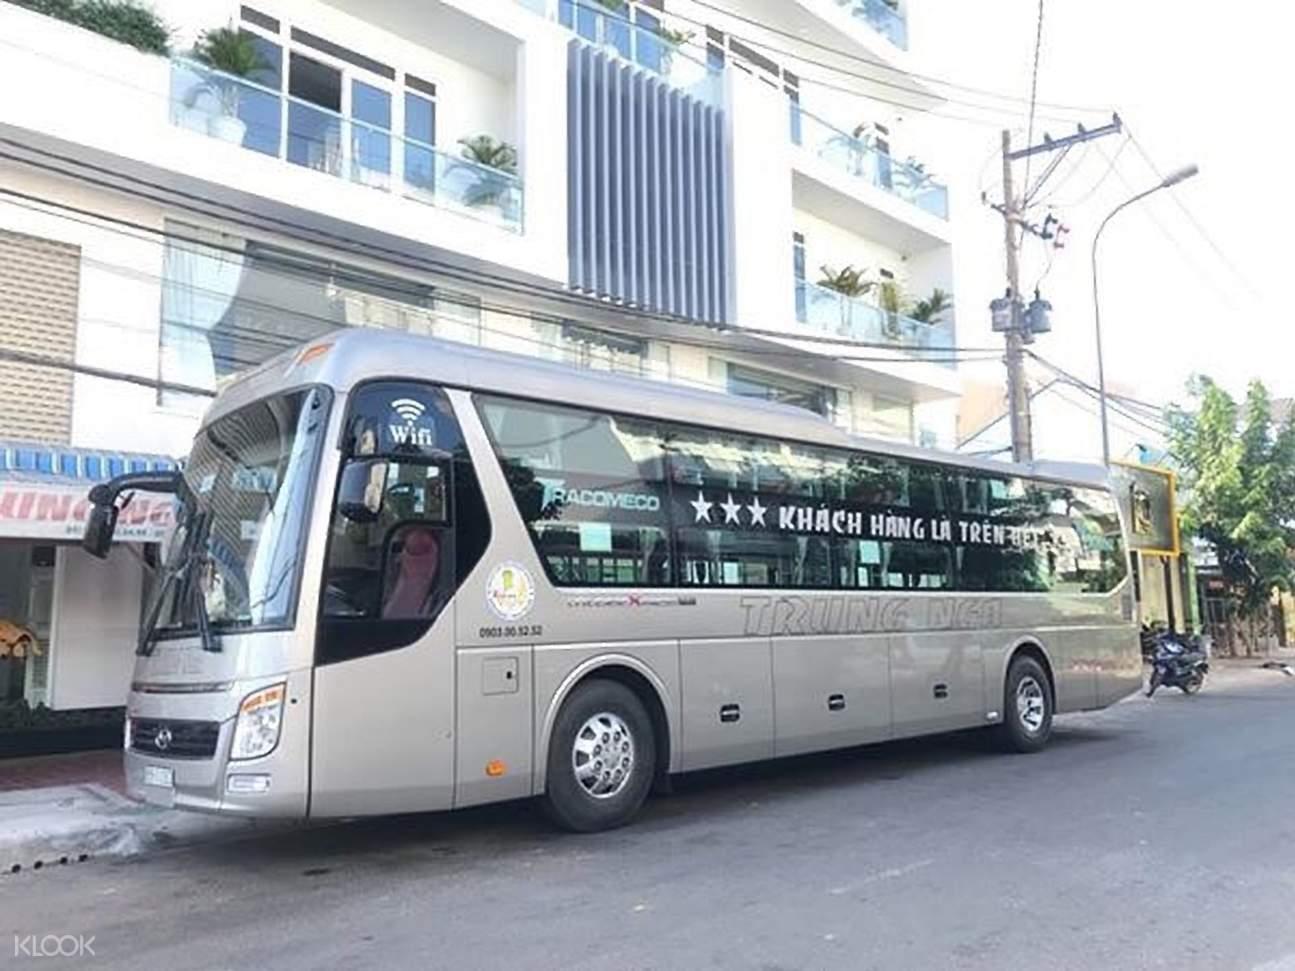 trung nga sleeper bus transfer from ho chi minh city to phan thiet